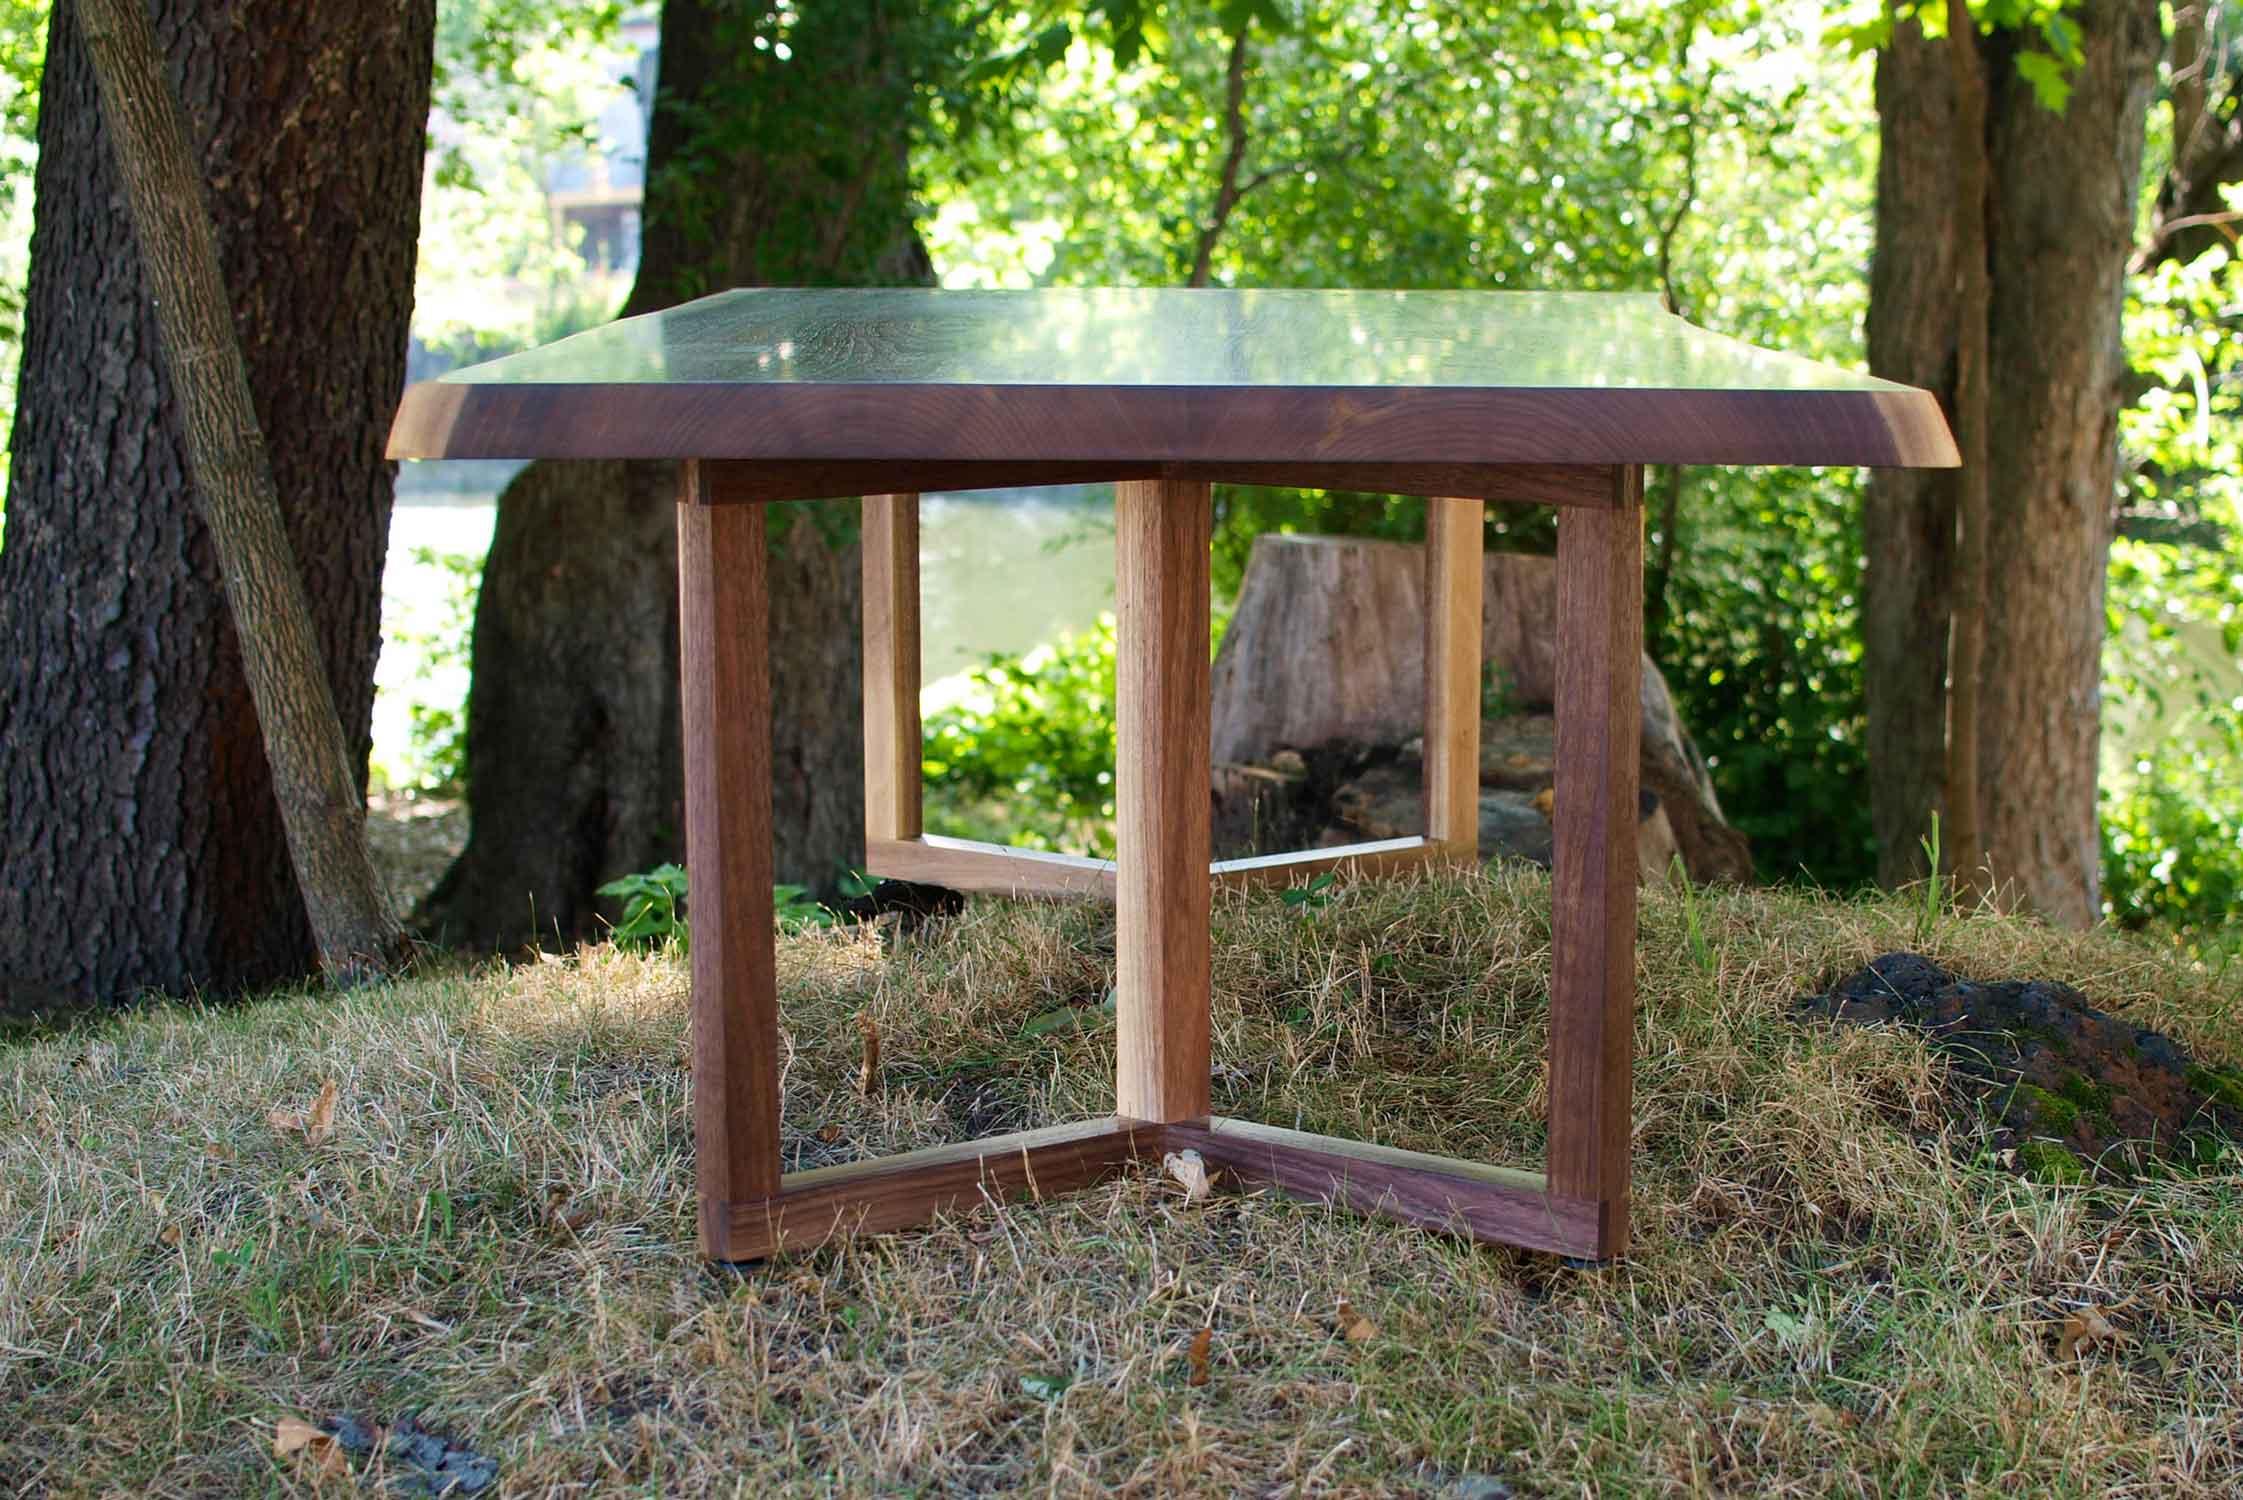 wickham-open-chevron-coffee-table-7261757.jpg